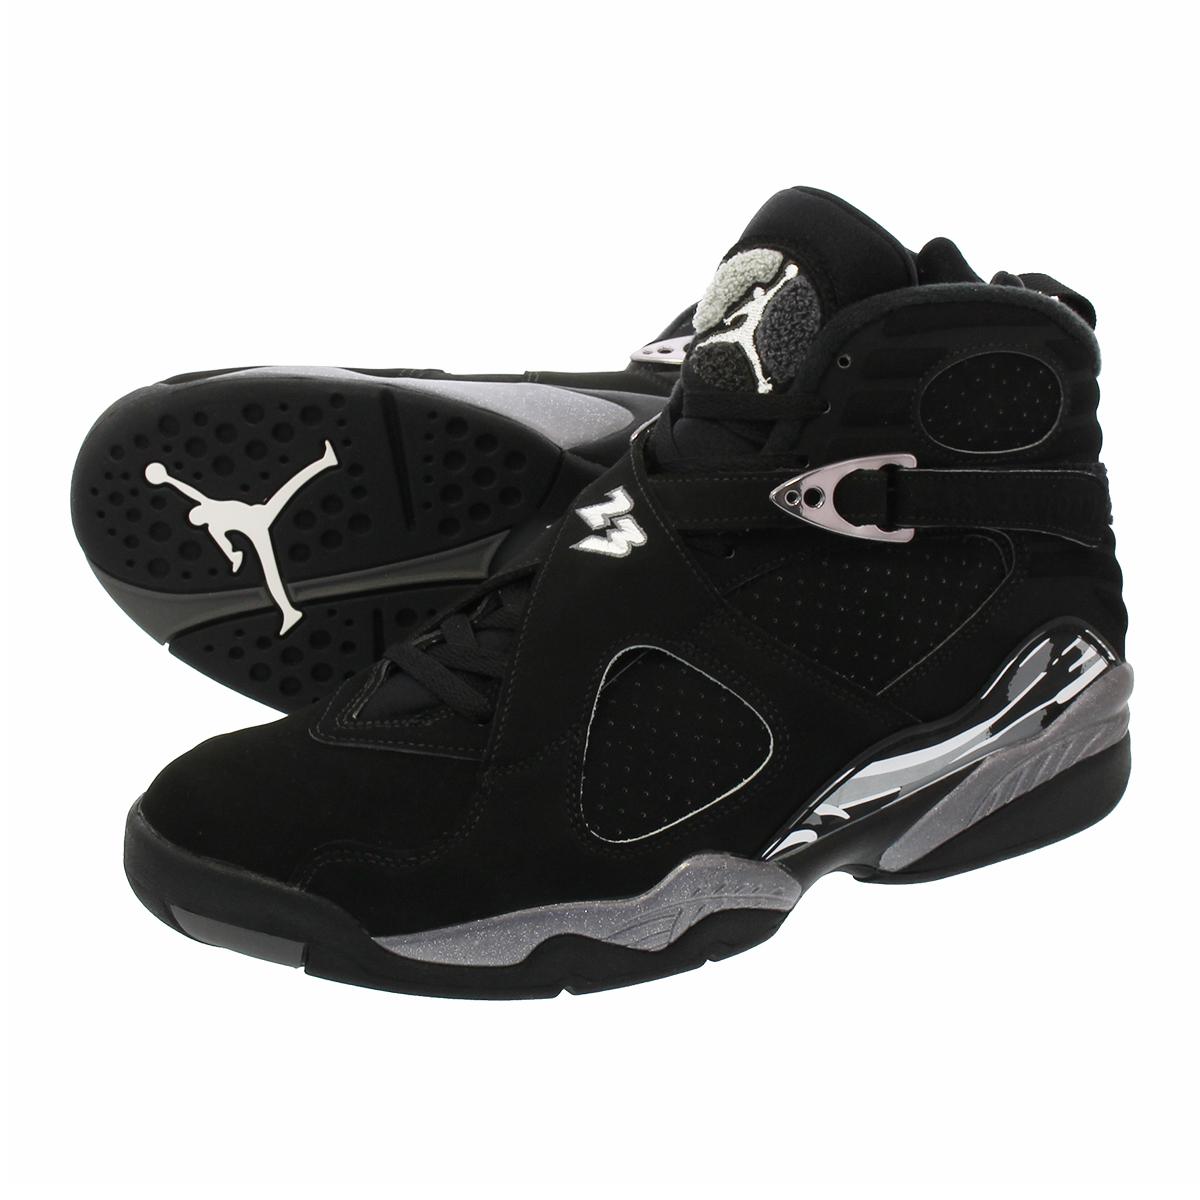 dc20ff25bc5 LOWTEX PLUS: NIKE AIR JORDAN 8 RETRO Nike Air Jordan 8 nostalgic BLACK/ CHROME 305,381-003 | Rakuten Global Market